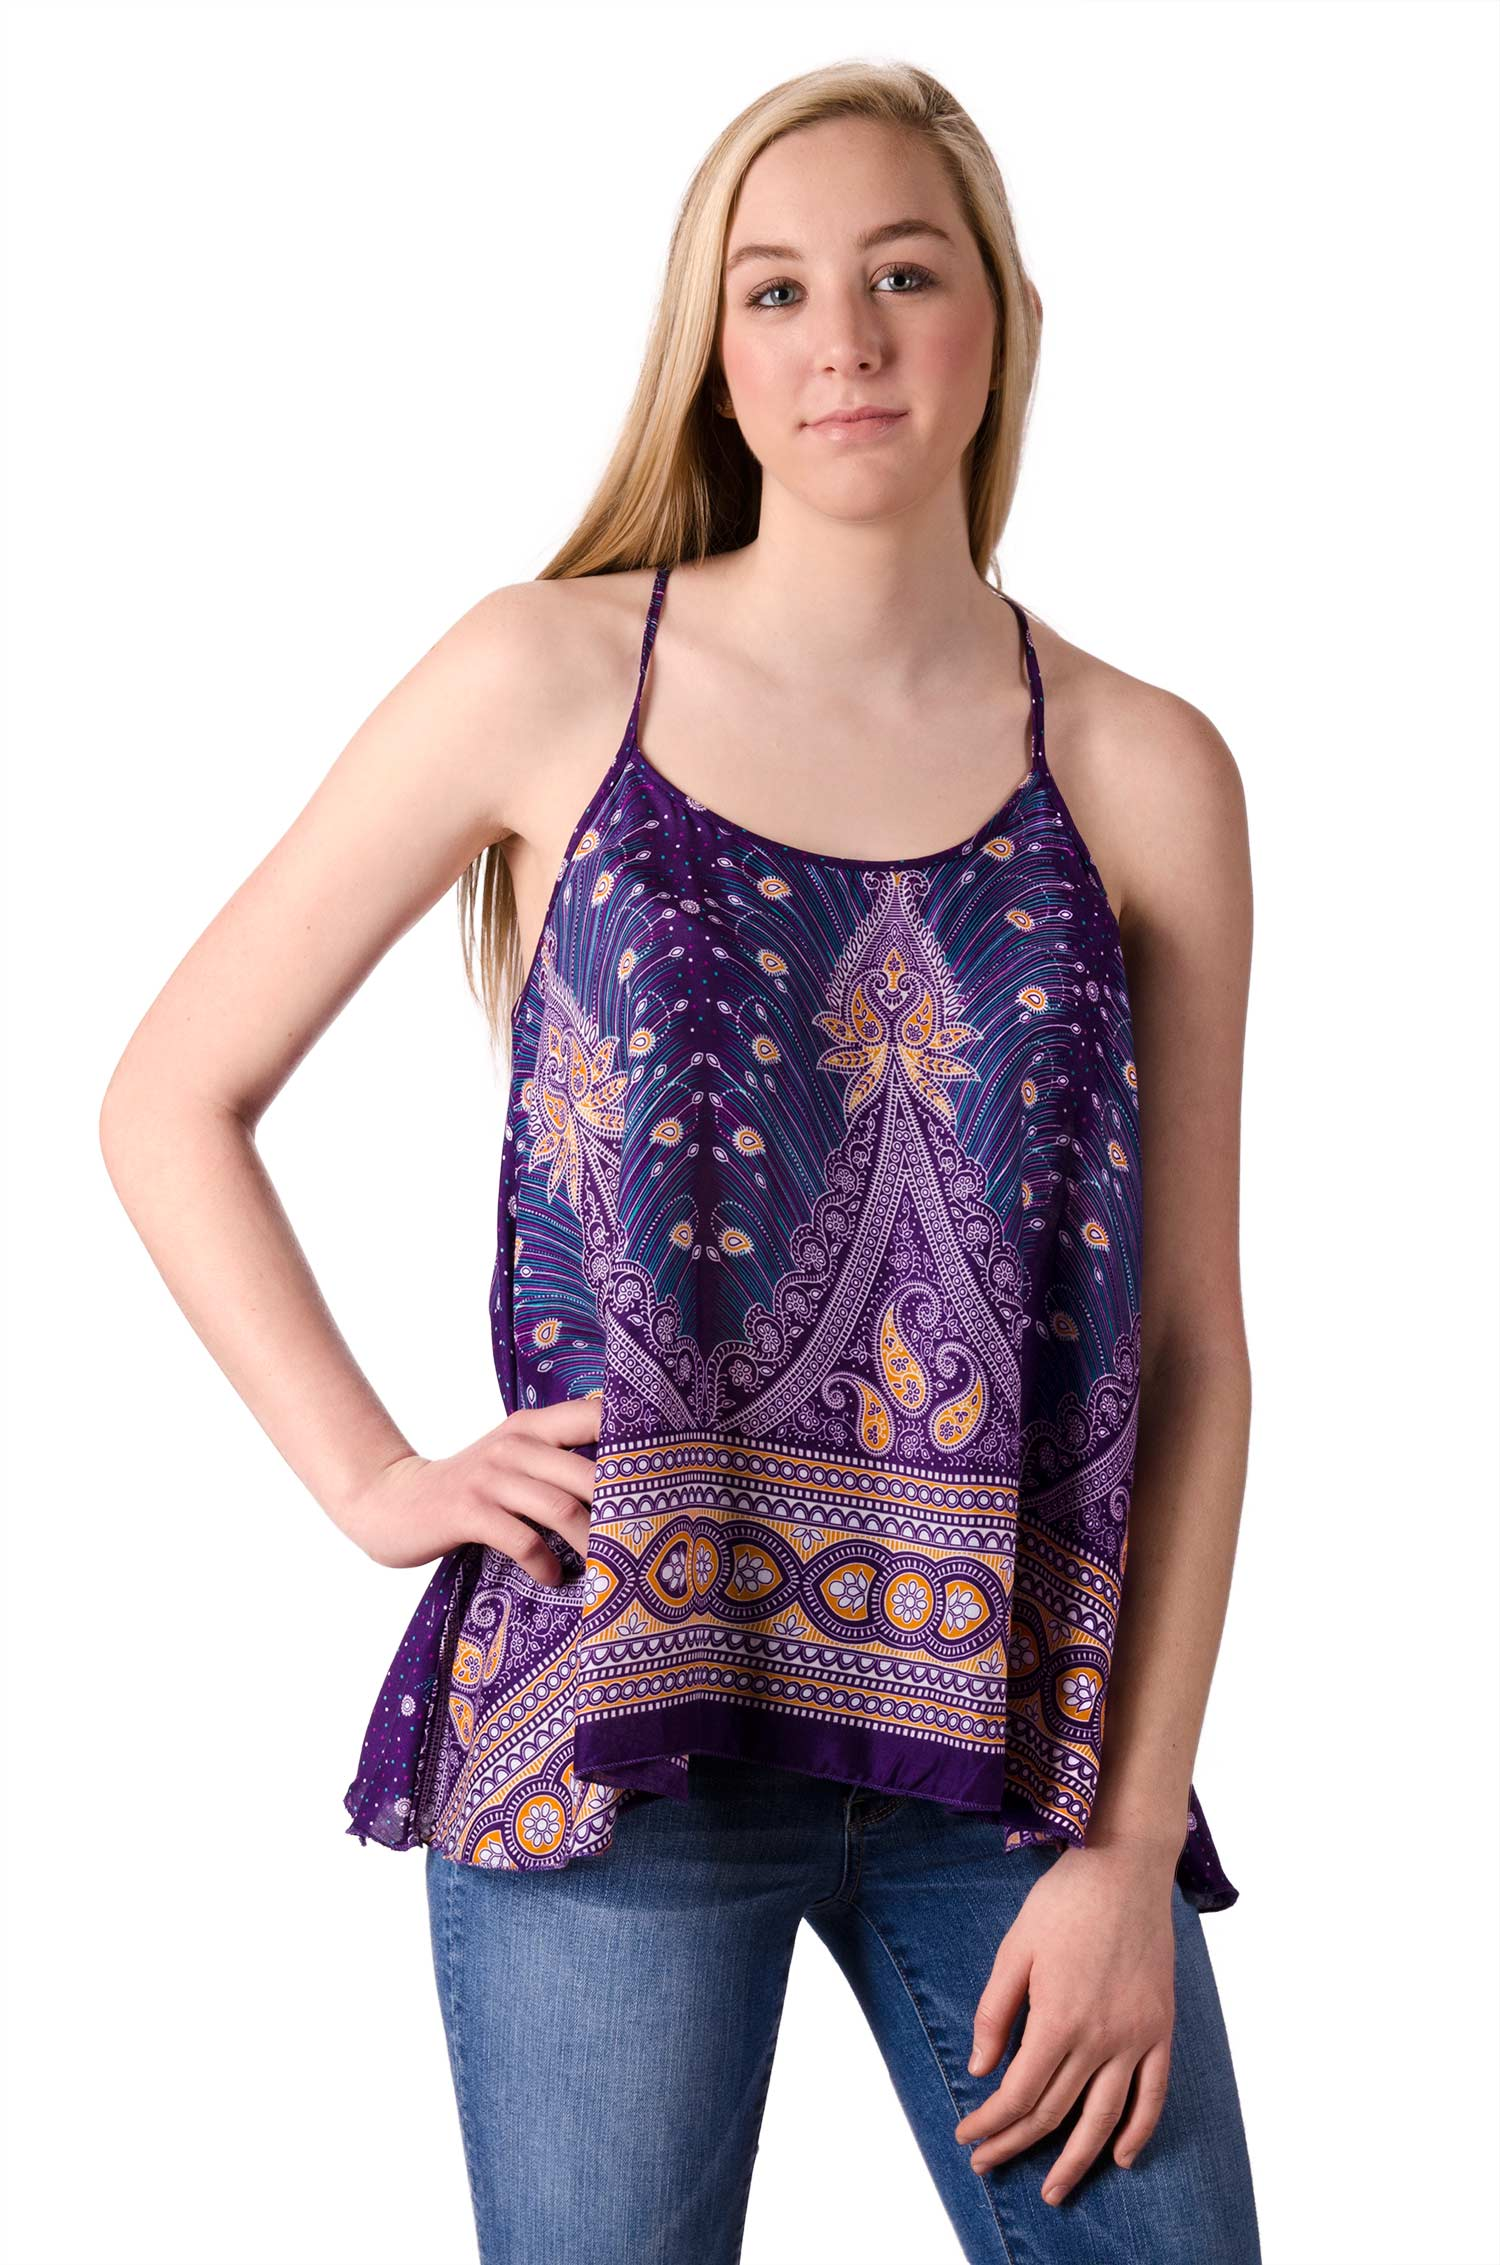 Peacock Print Cami Top - Purple Multi - 4484U